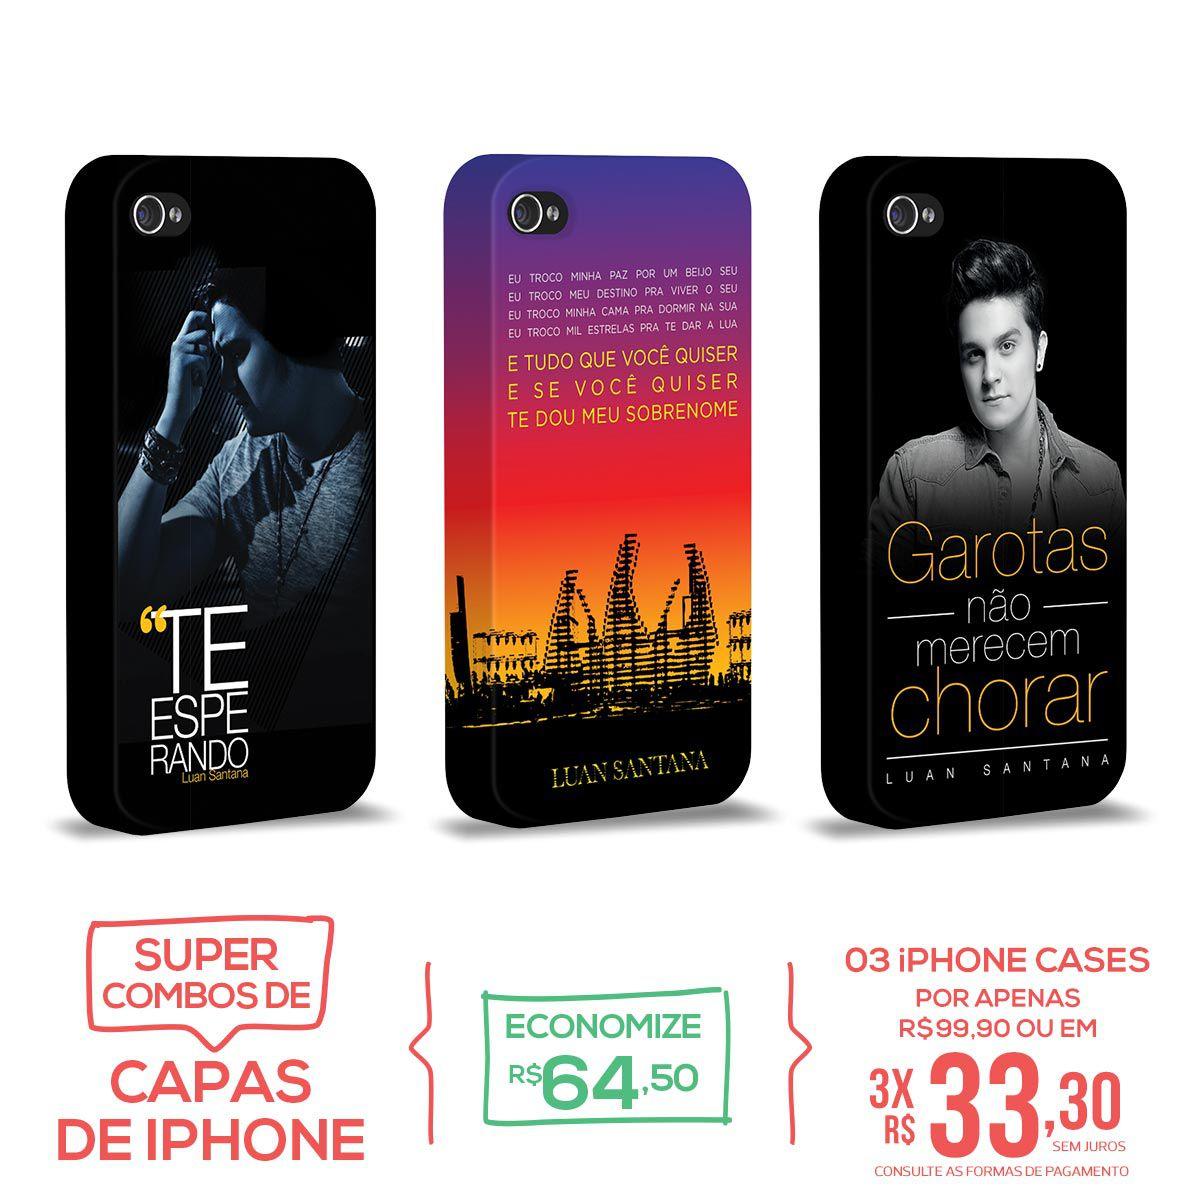 Kit Com 3 Capas de iPhone 4/4S Luan Santana - Concept